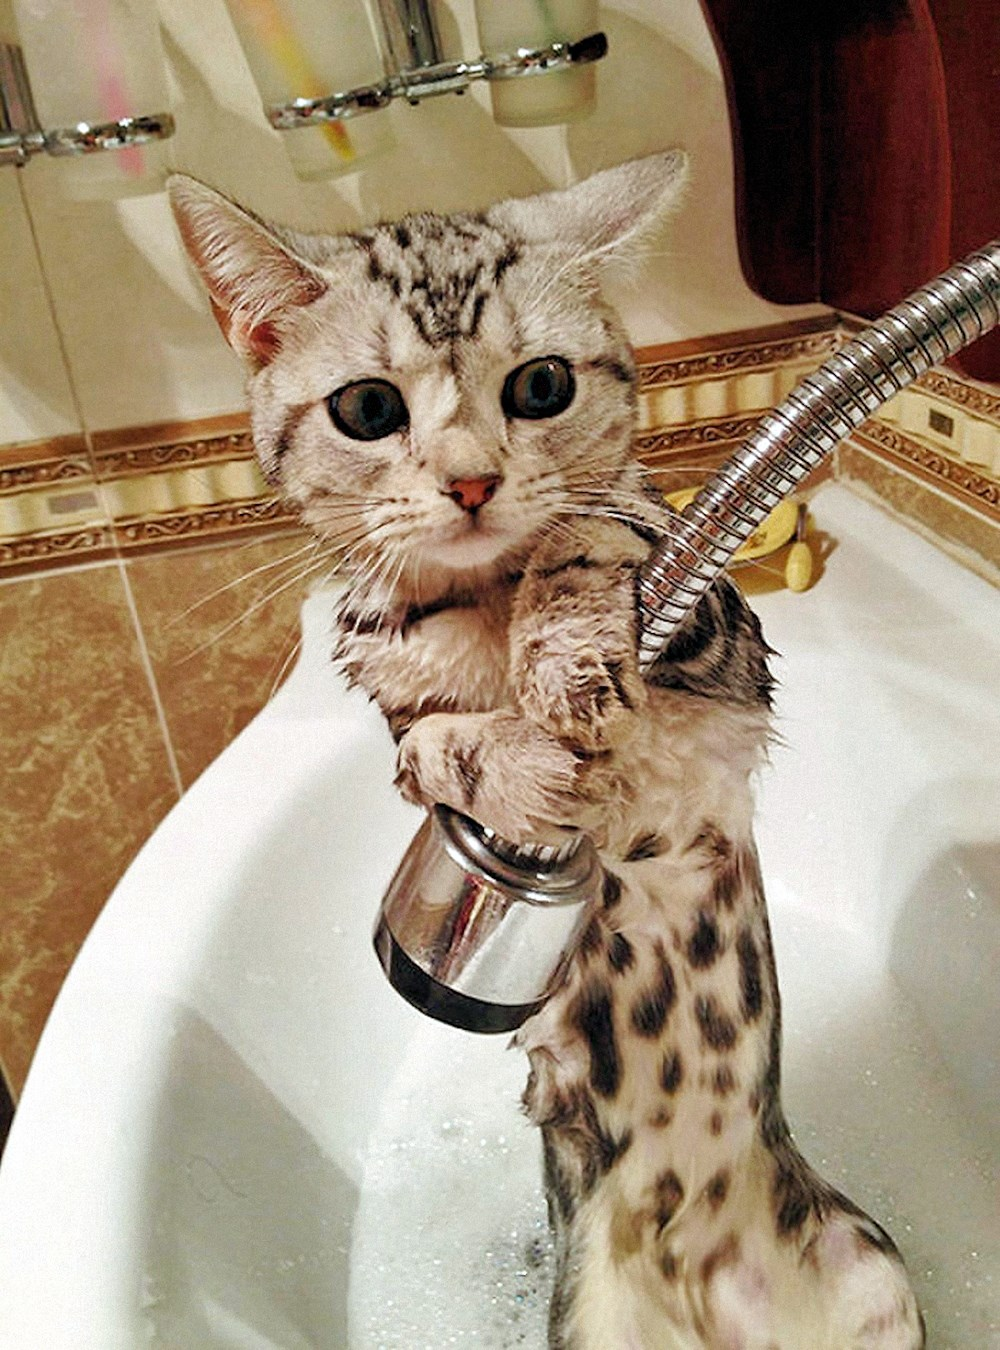 00 animals bath 05. 280715